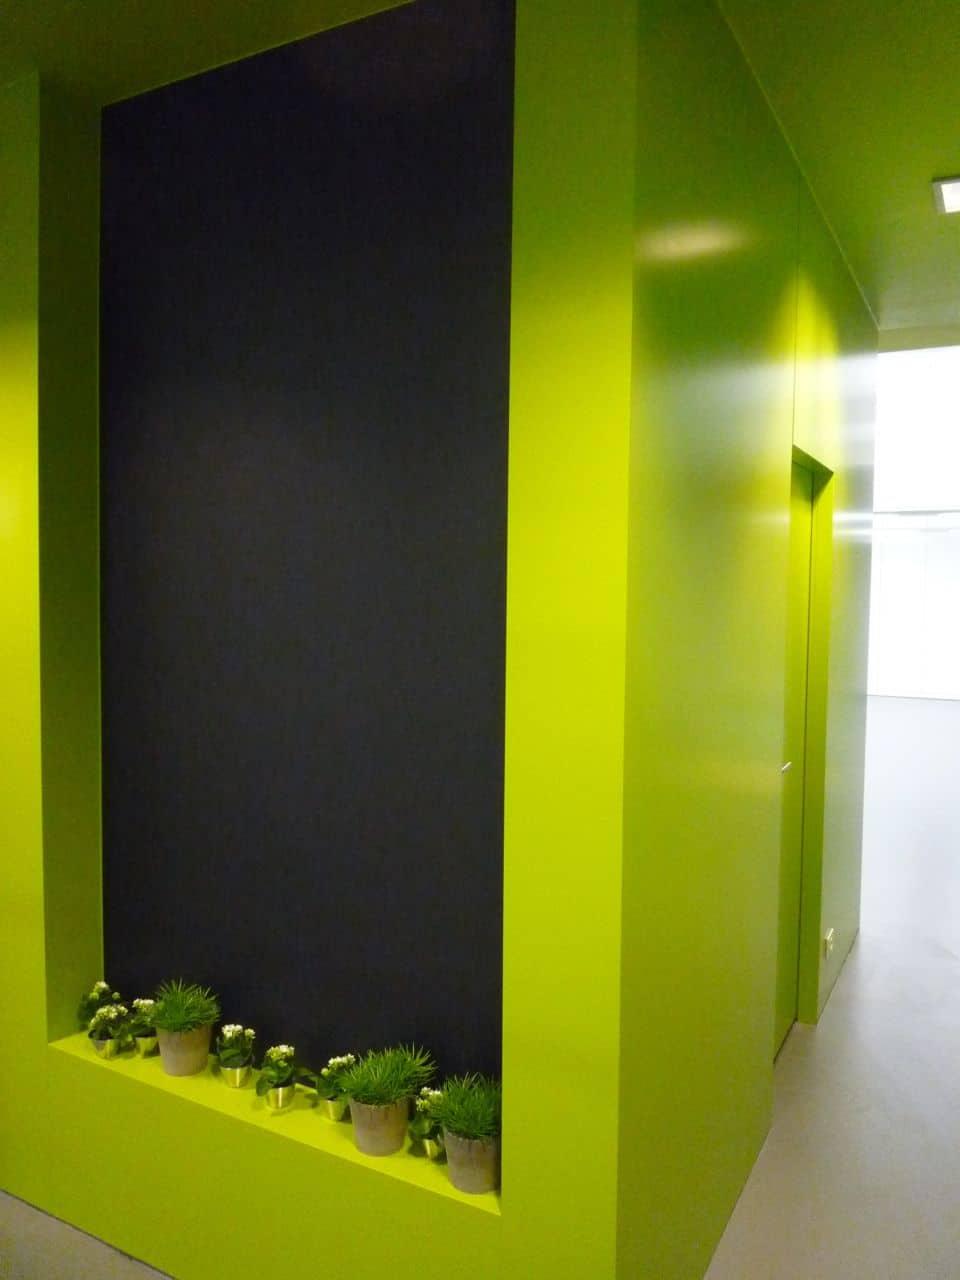 P1060735 | Baeyens & Beck architecten Gent | architect nieuwbouw renovatie interieur | high end | architectenbureau